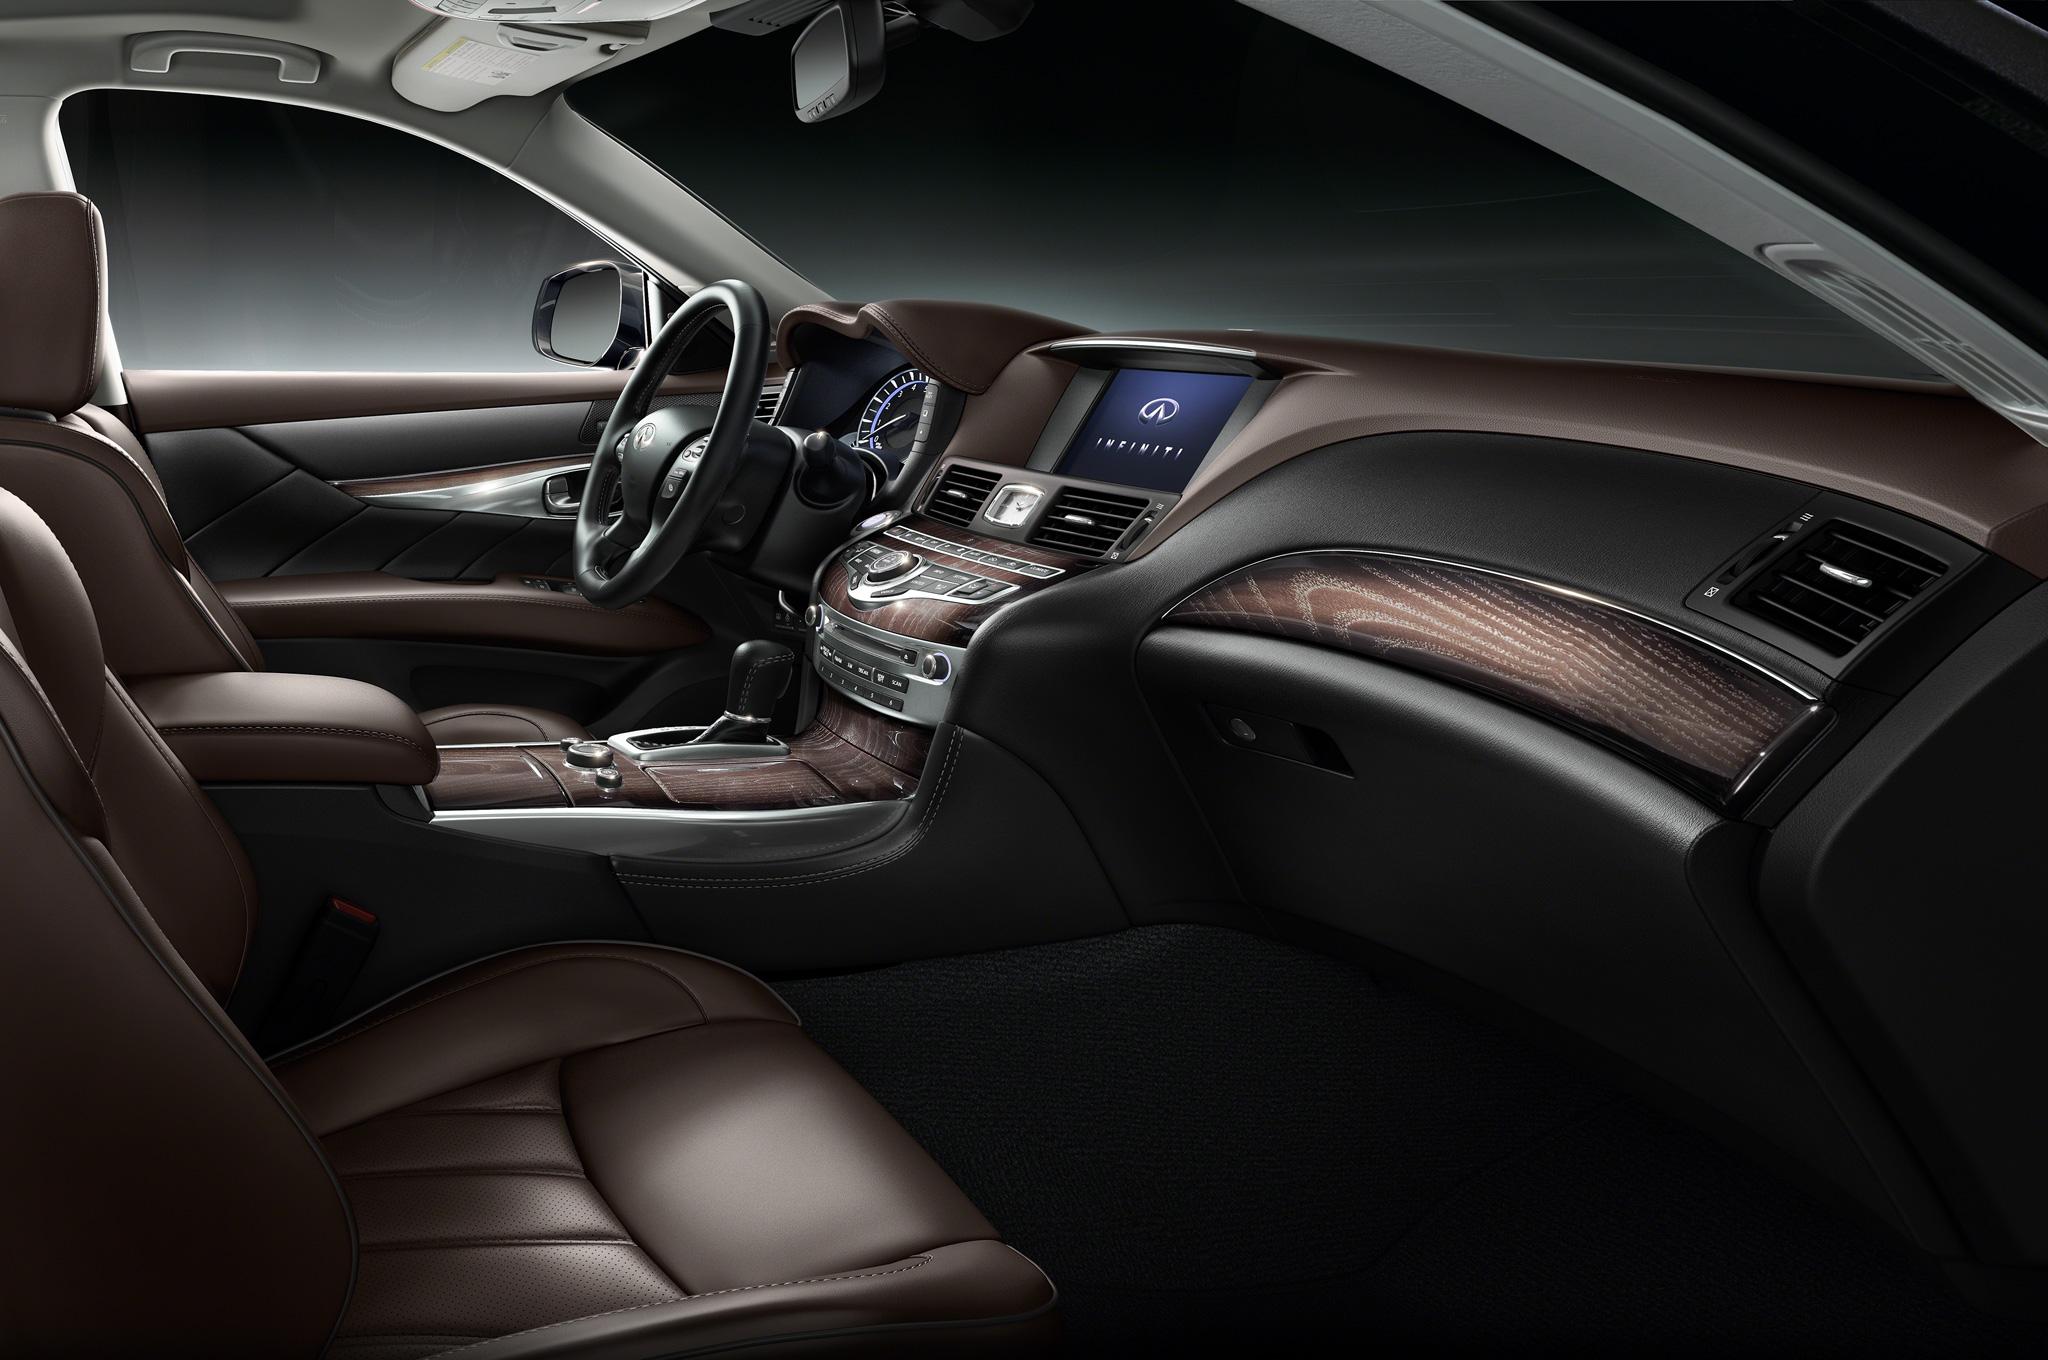 2015 Infiniti Q70L Cockpit and Front Interior